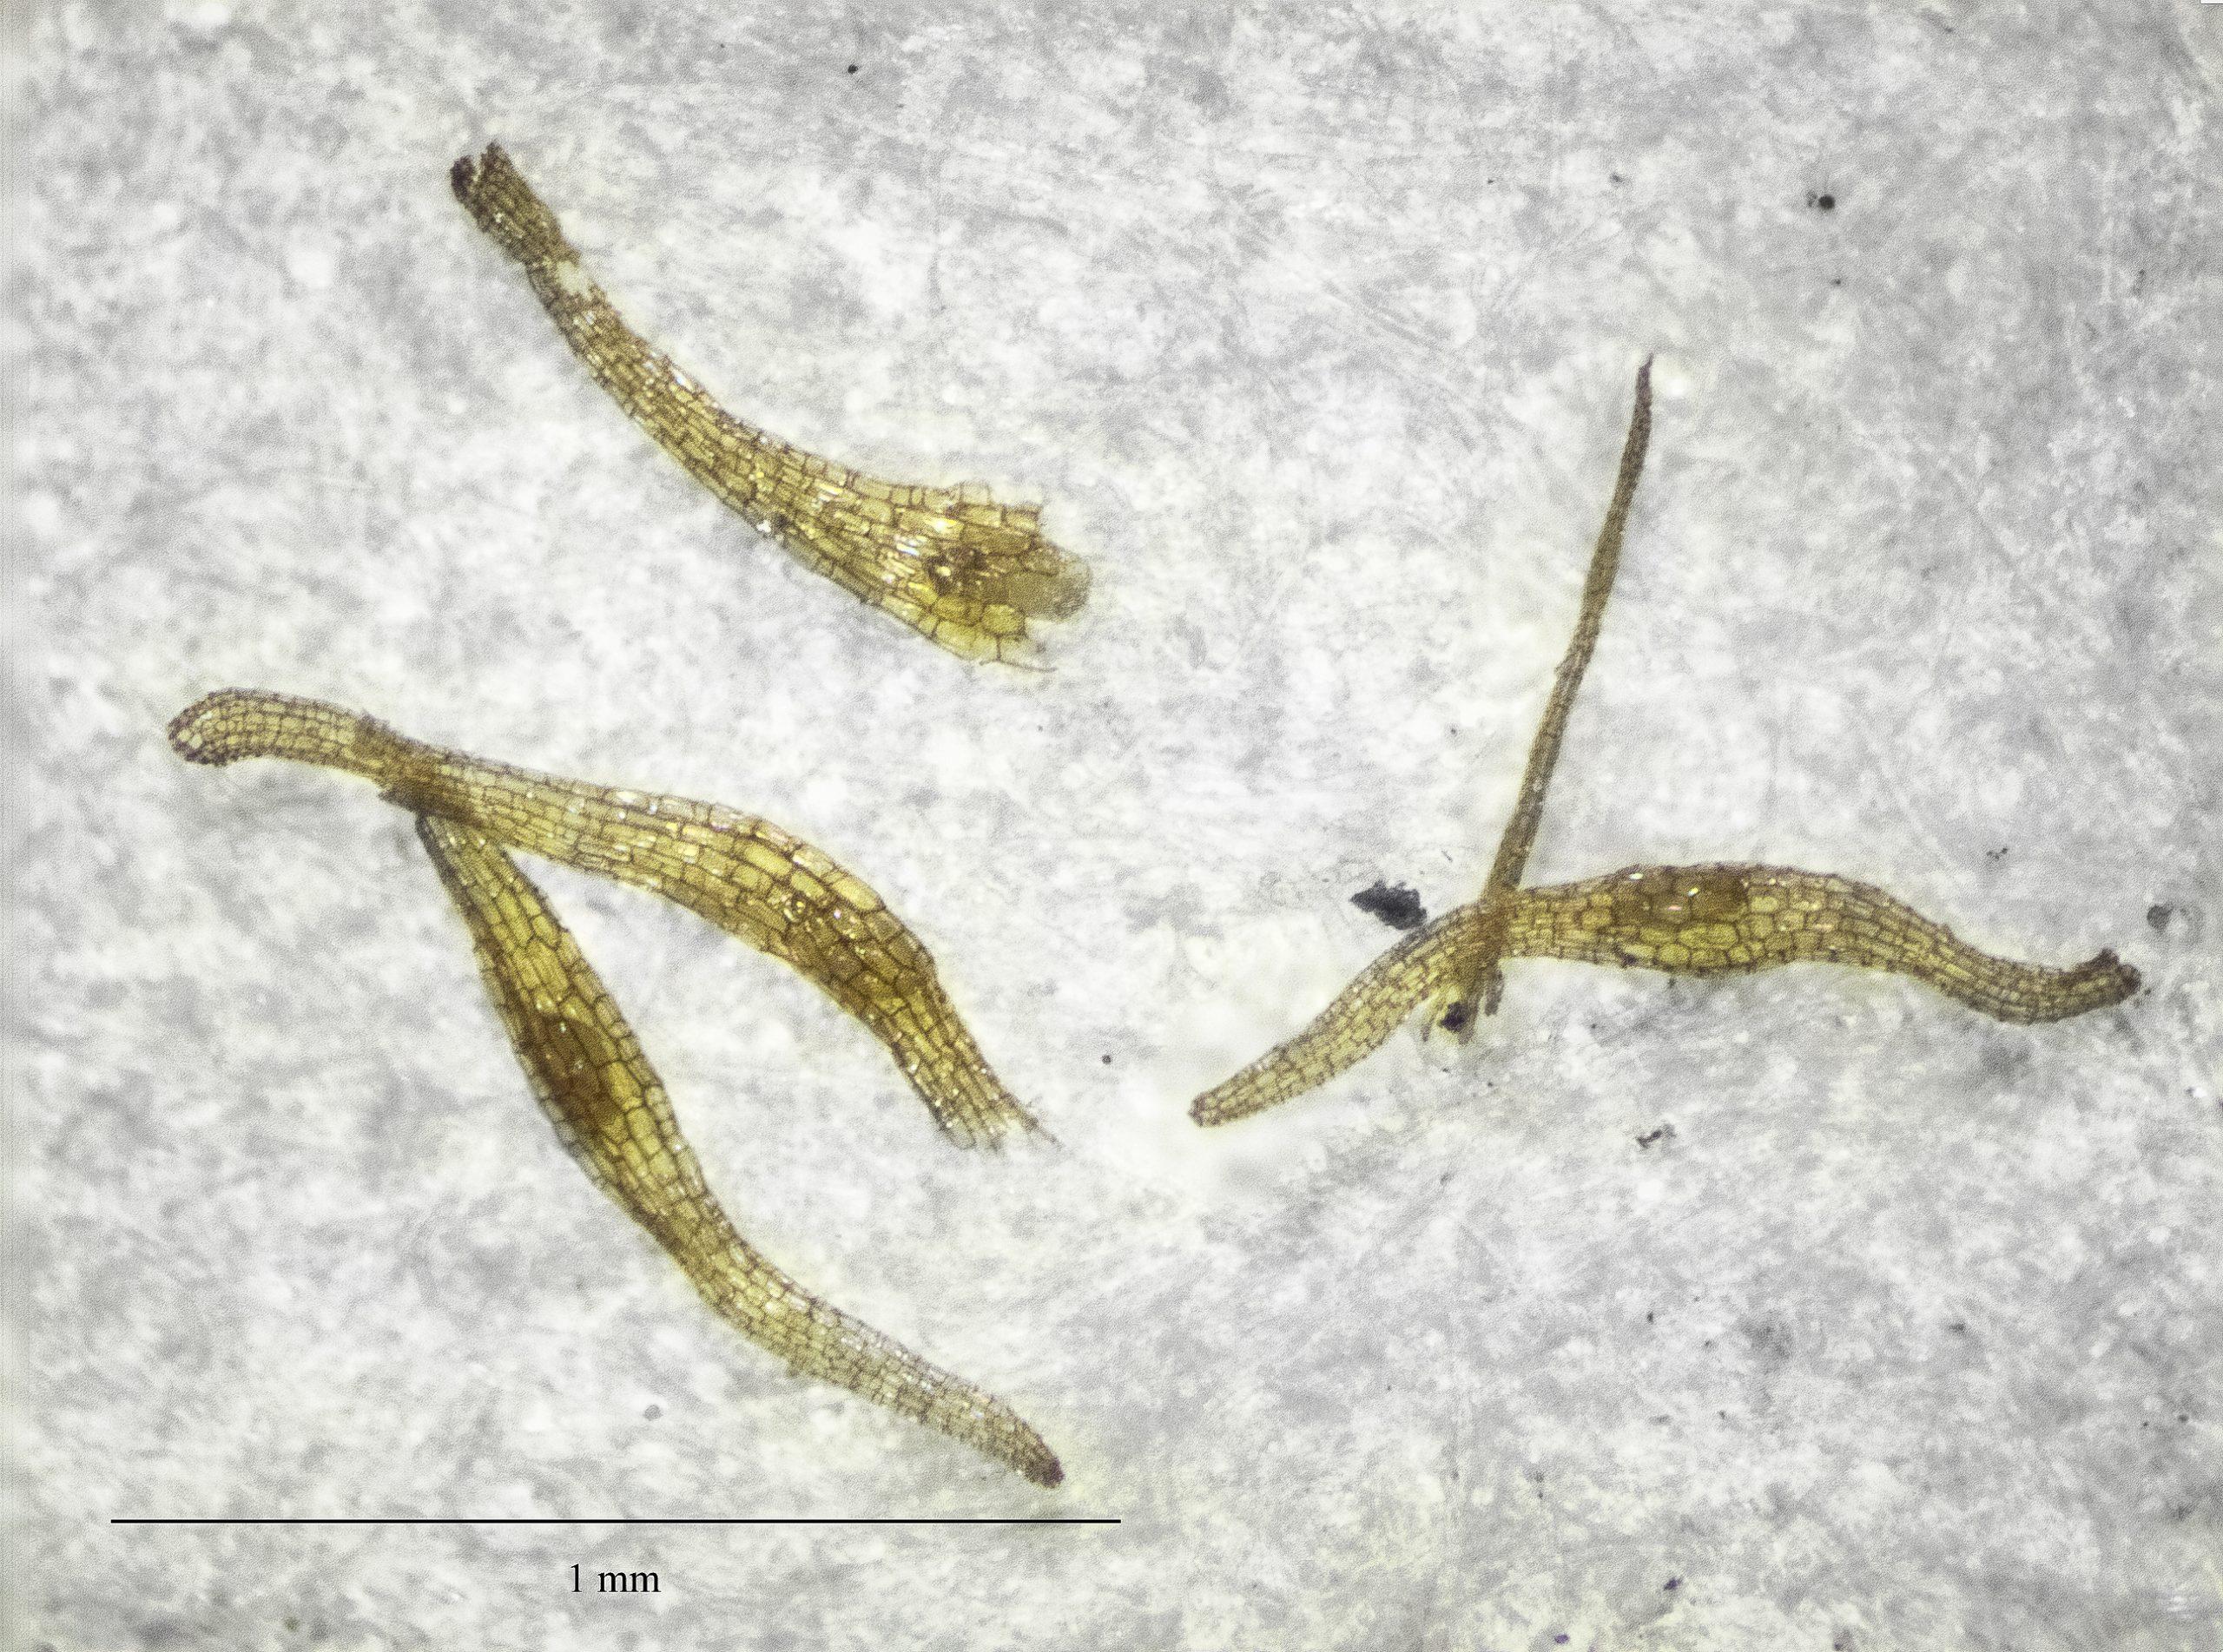 Photo of Honohono seed under a microscope.